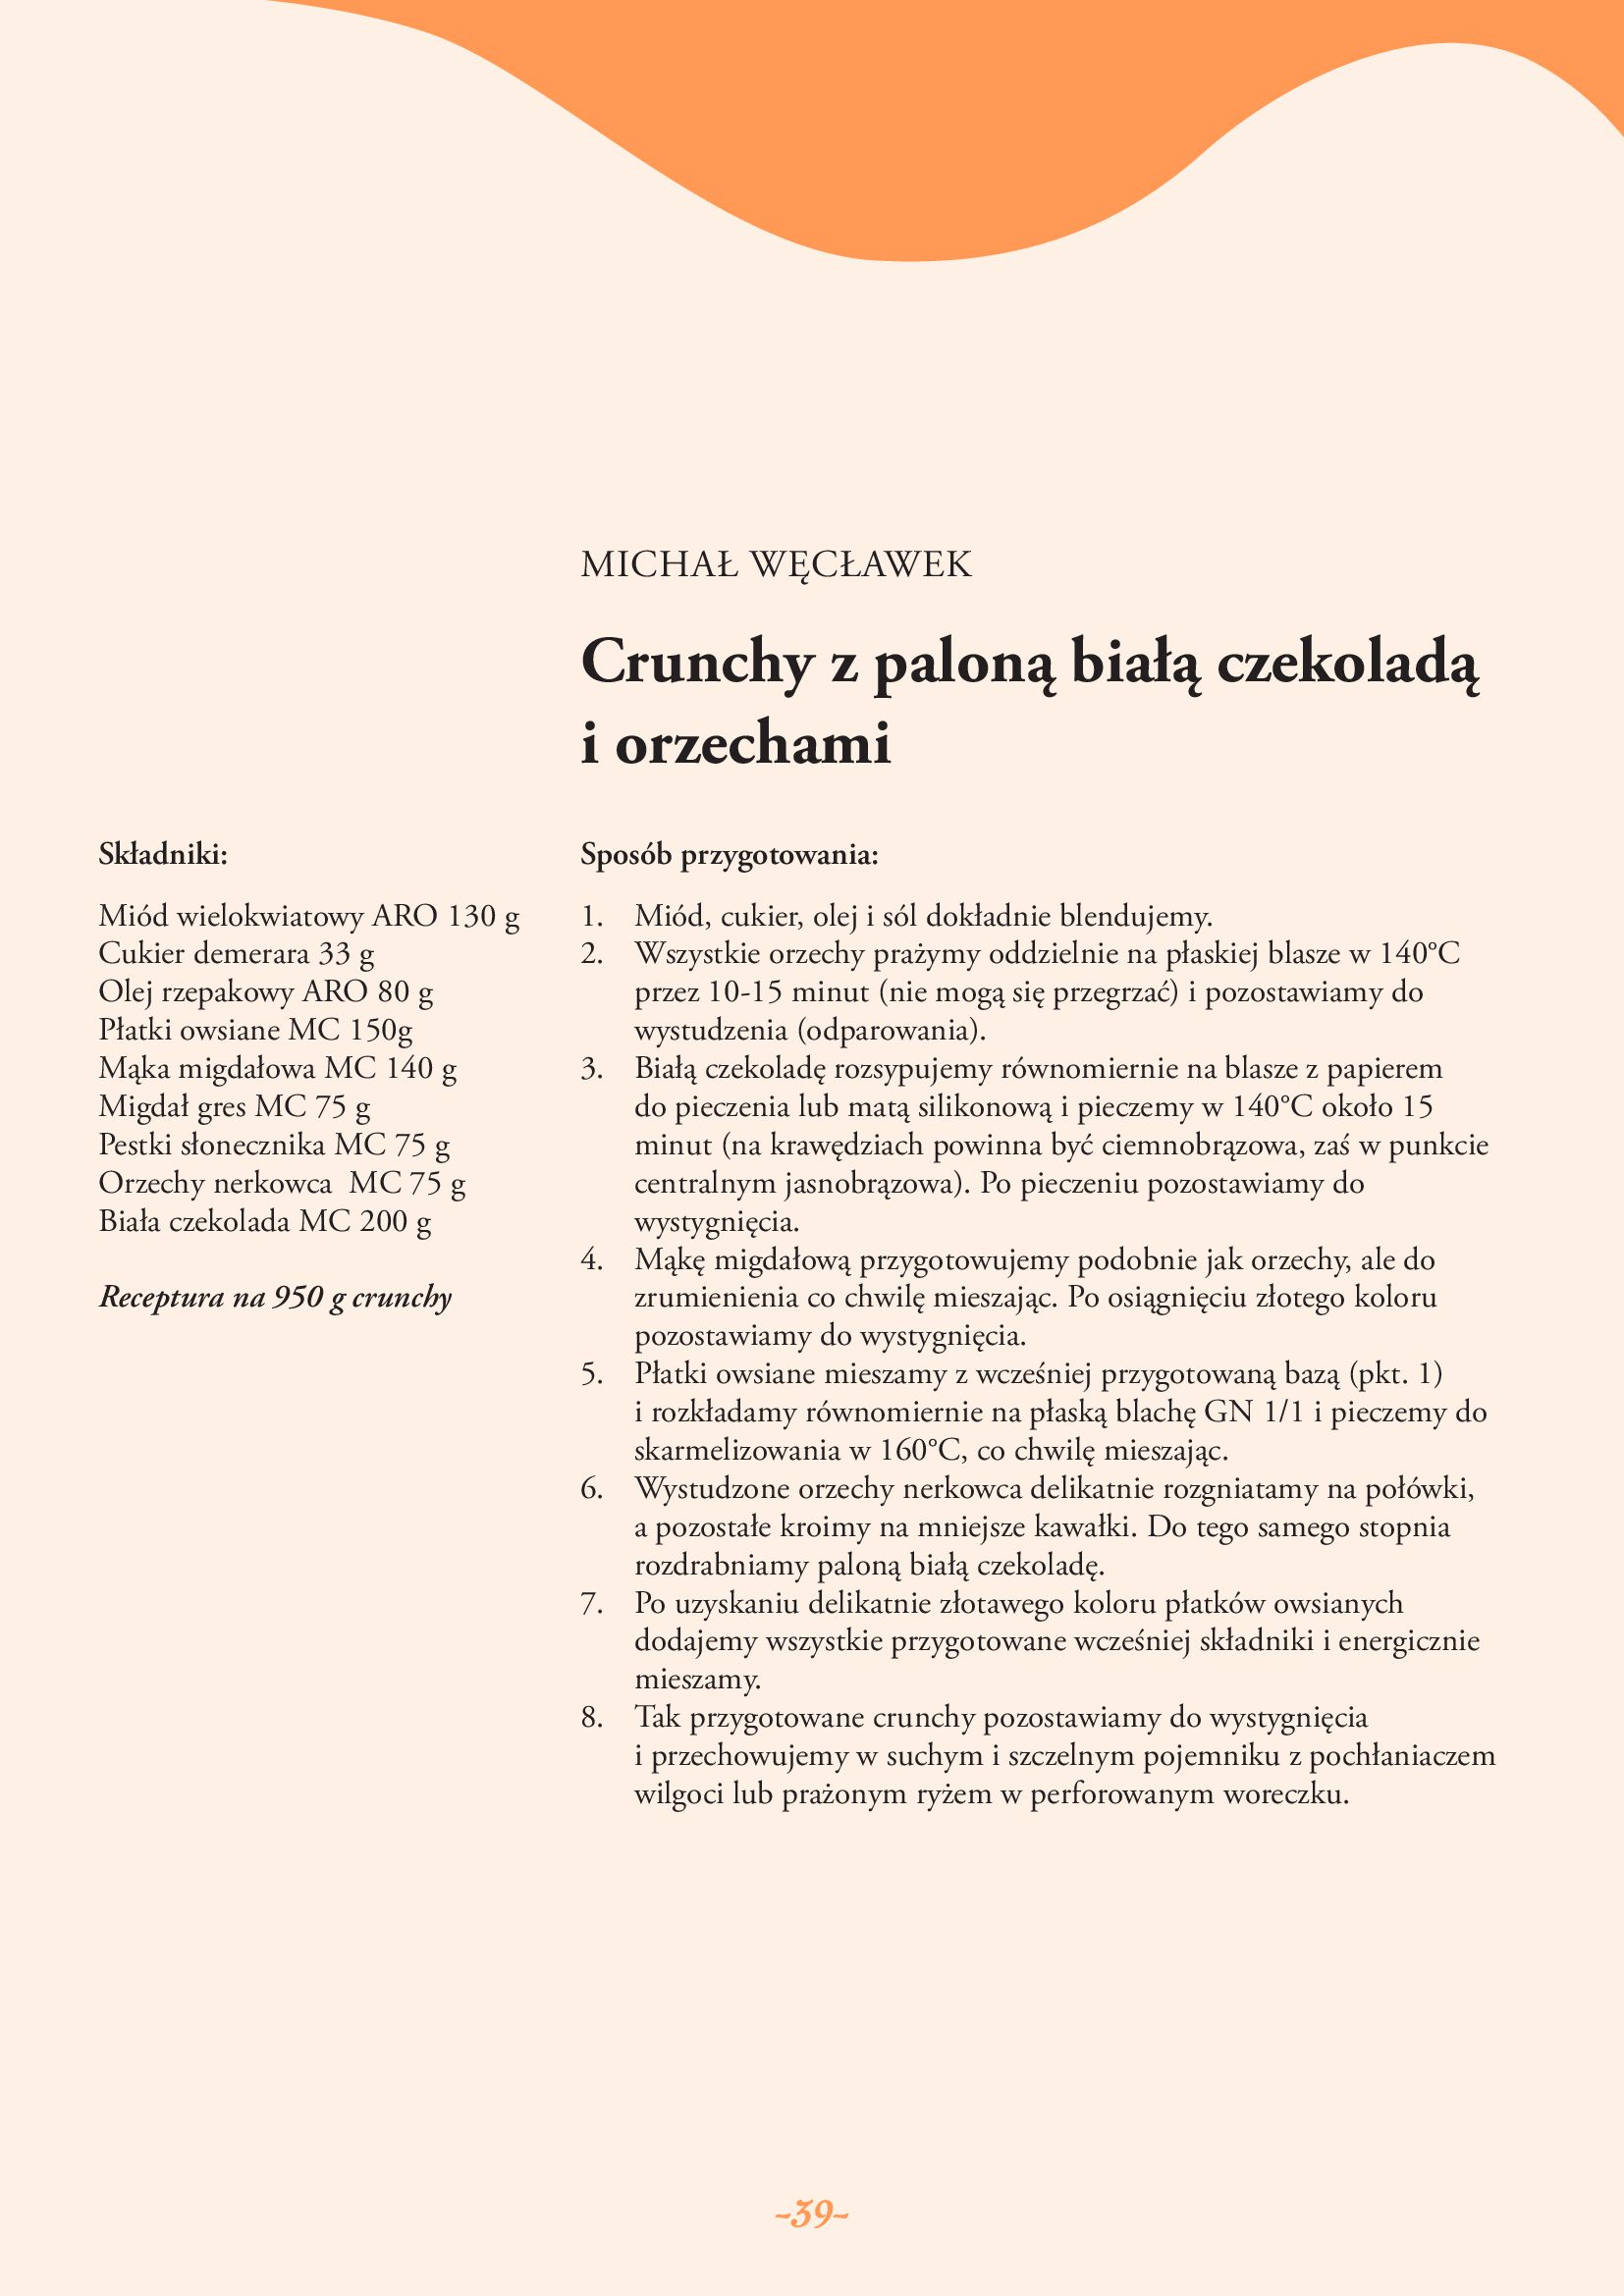 Gazetka Makro: Gazetka Makro - lody i desery 2021-05-21 page-39